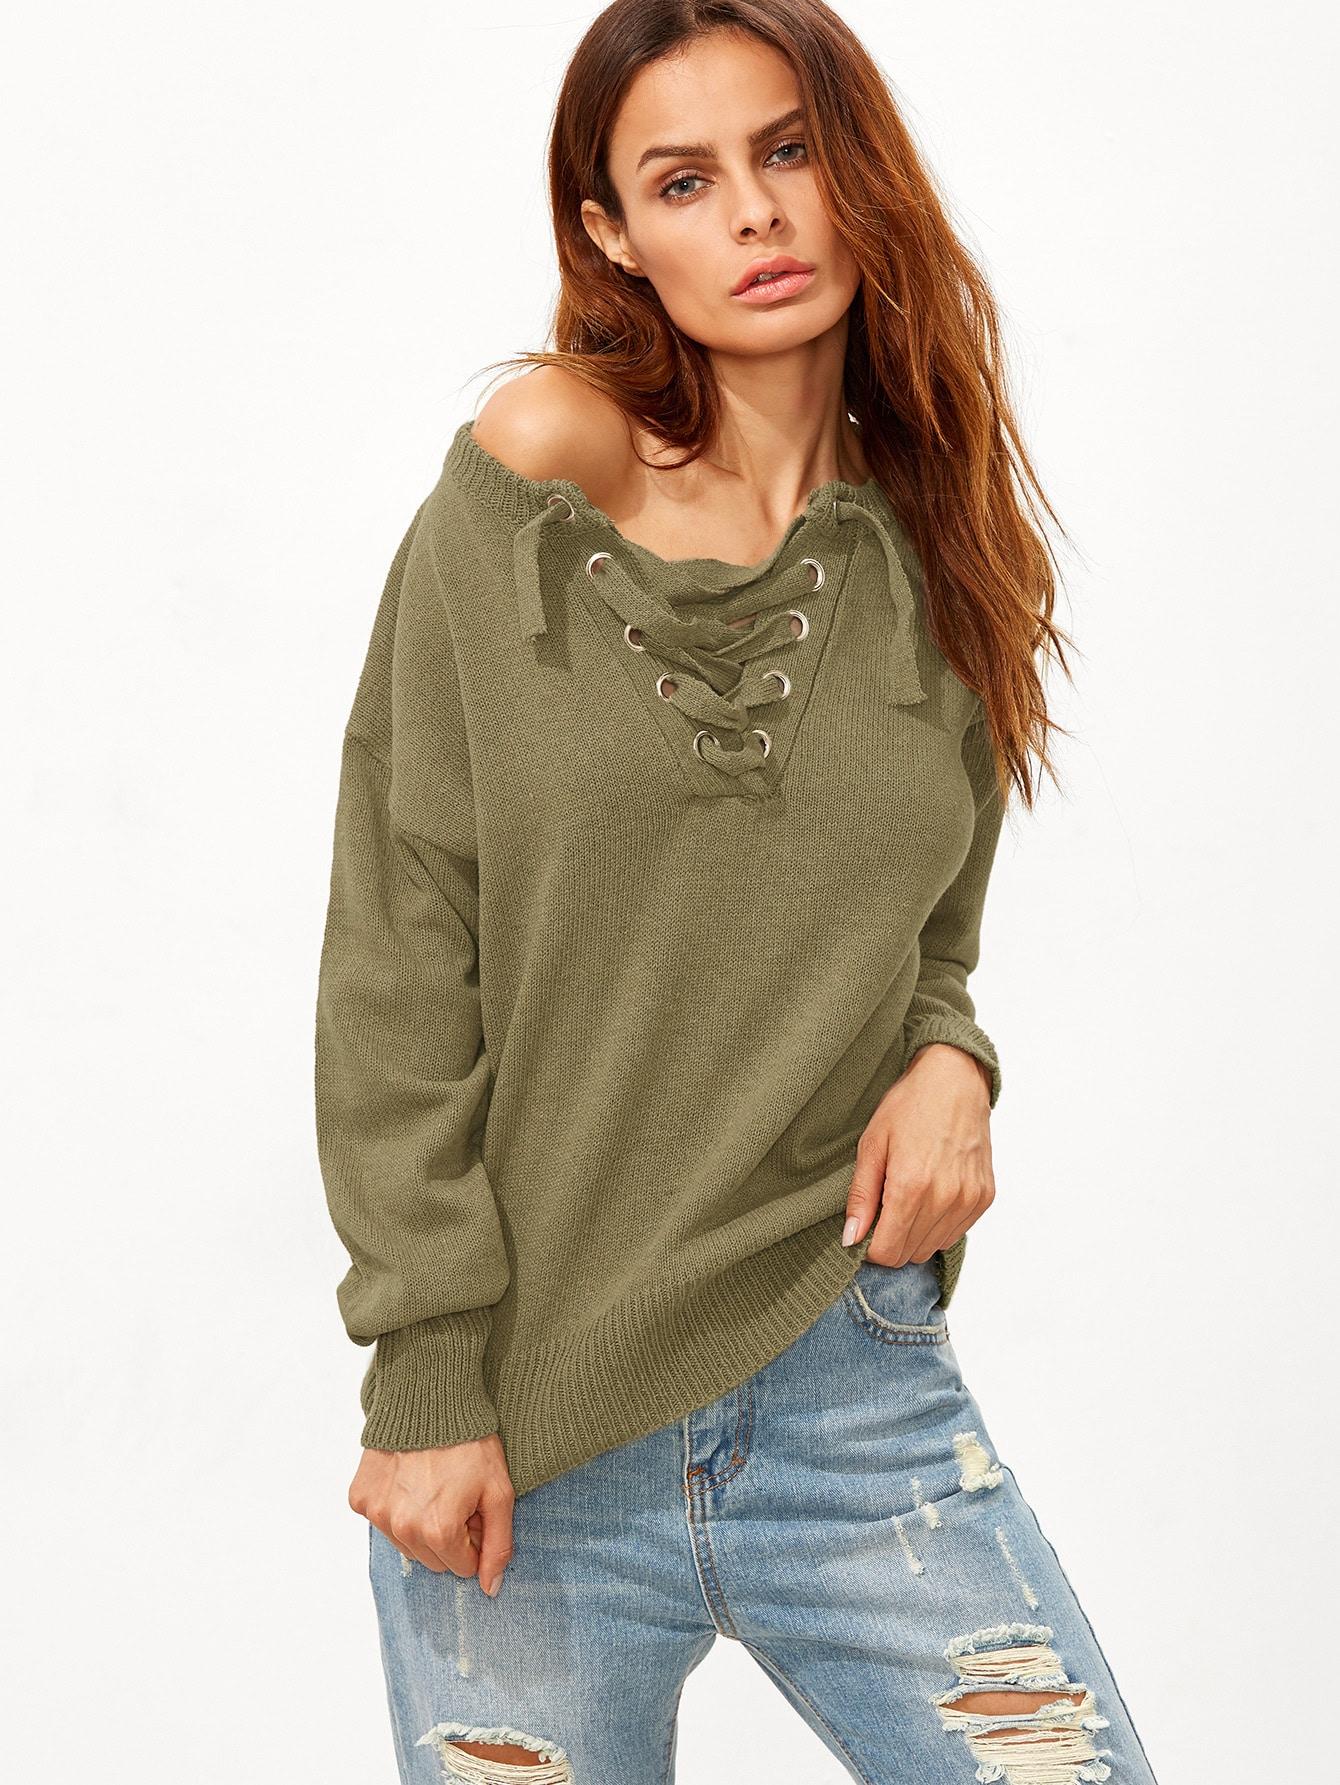 sweater160907121_2